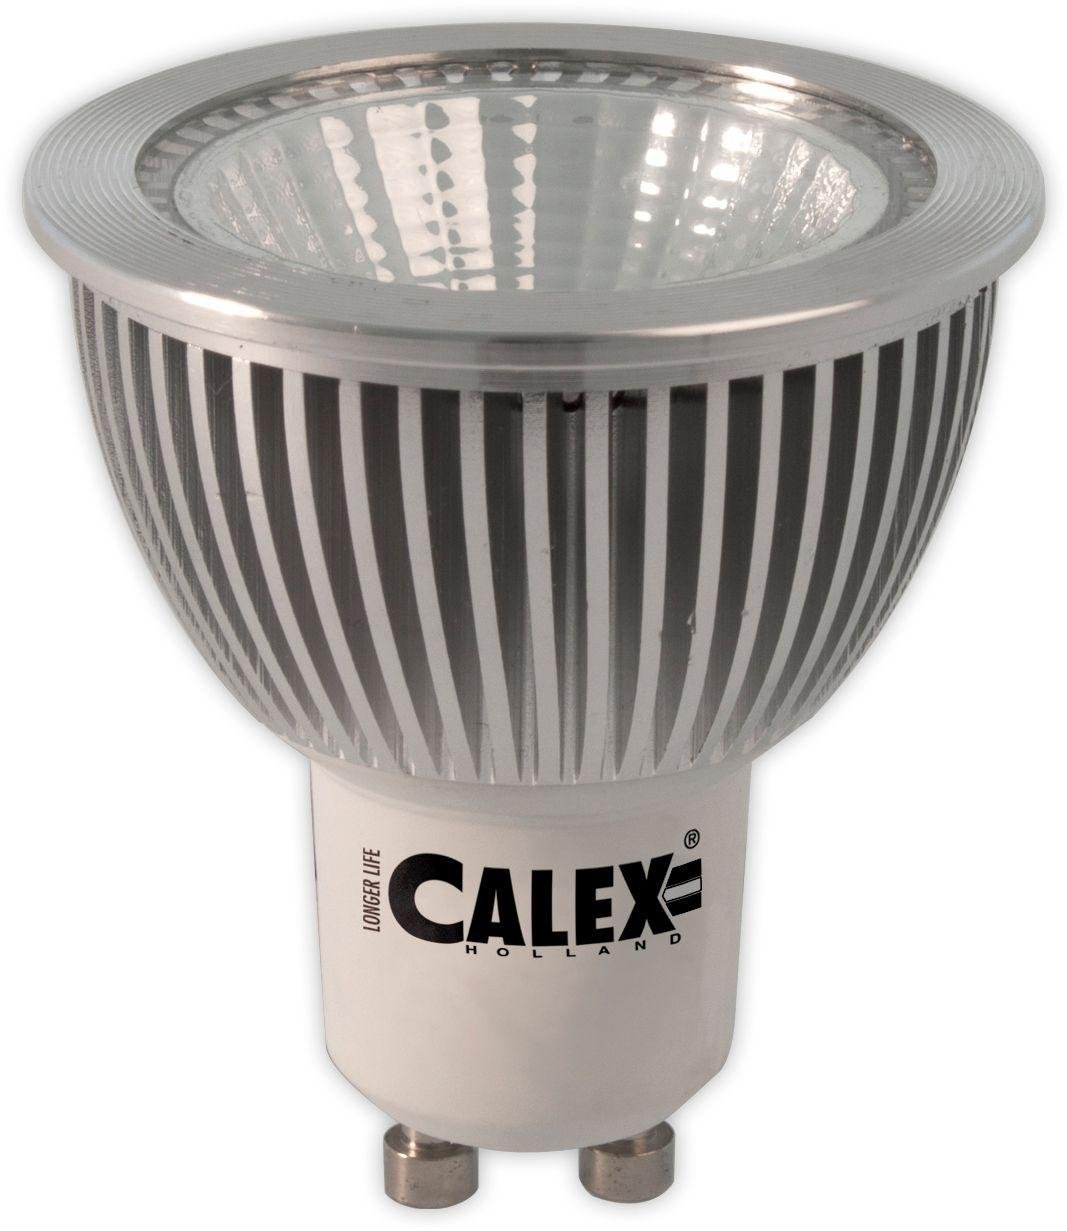 Calex LED Cob GU10 7W Warm White 450 Lumen Dimmable Bulb ...